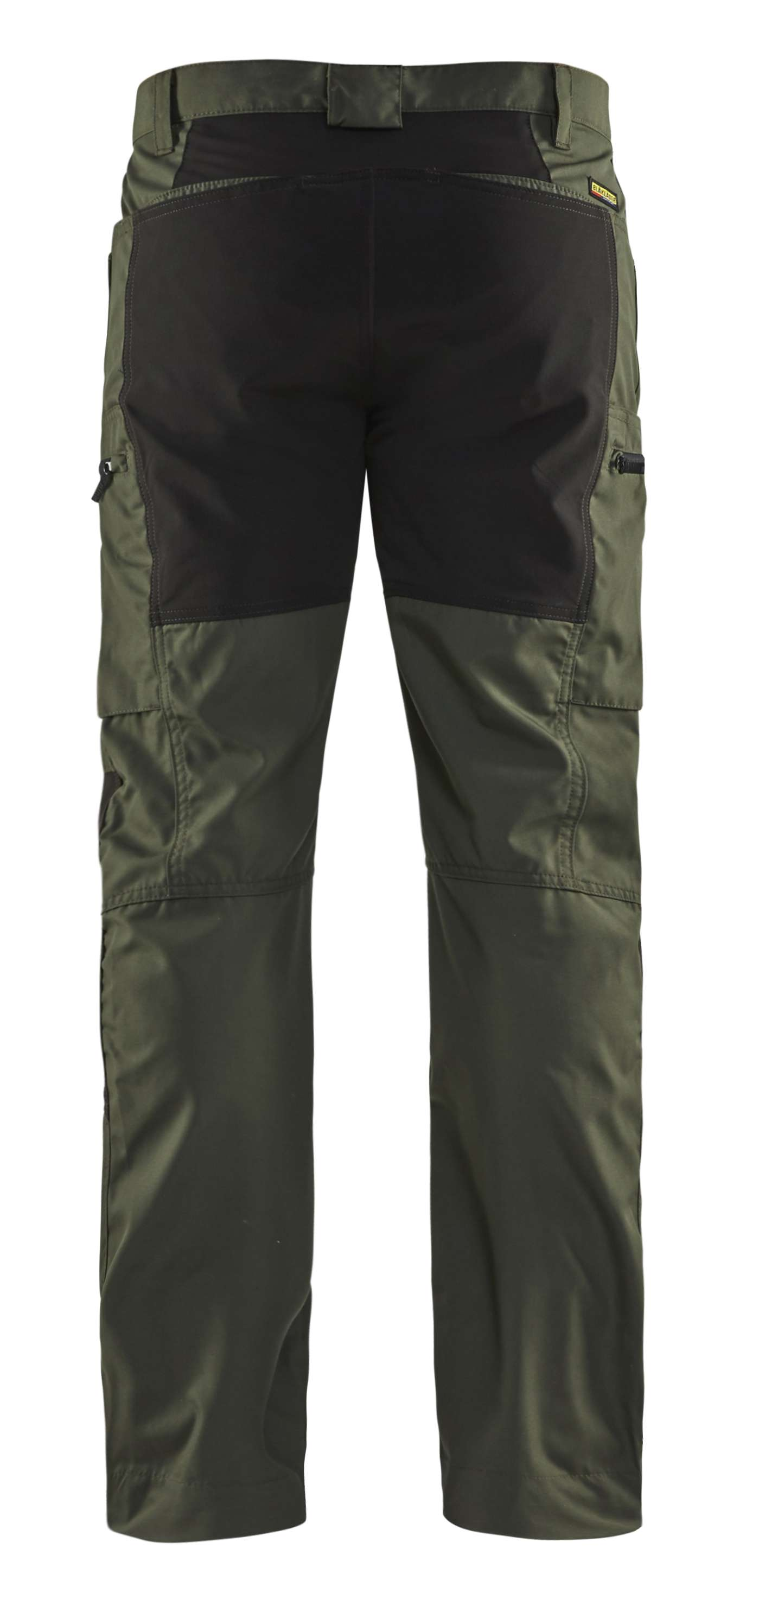 Blaklader Broeken 14591845 met Stretch army groen-zwart(4699)